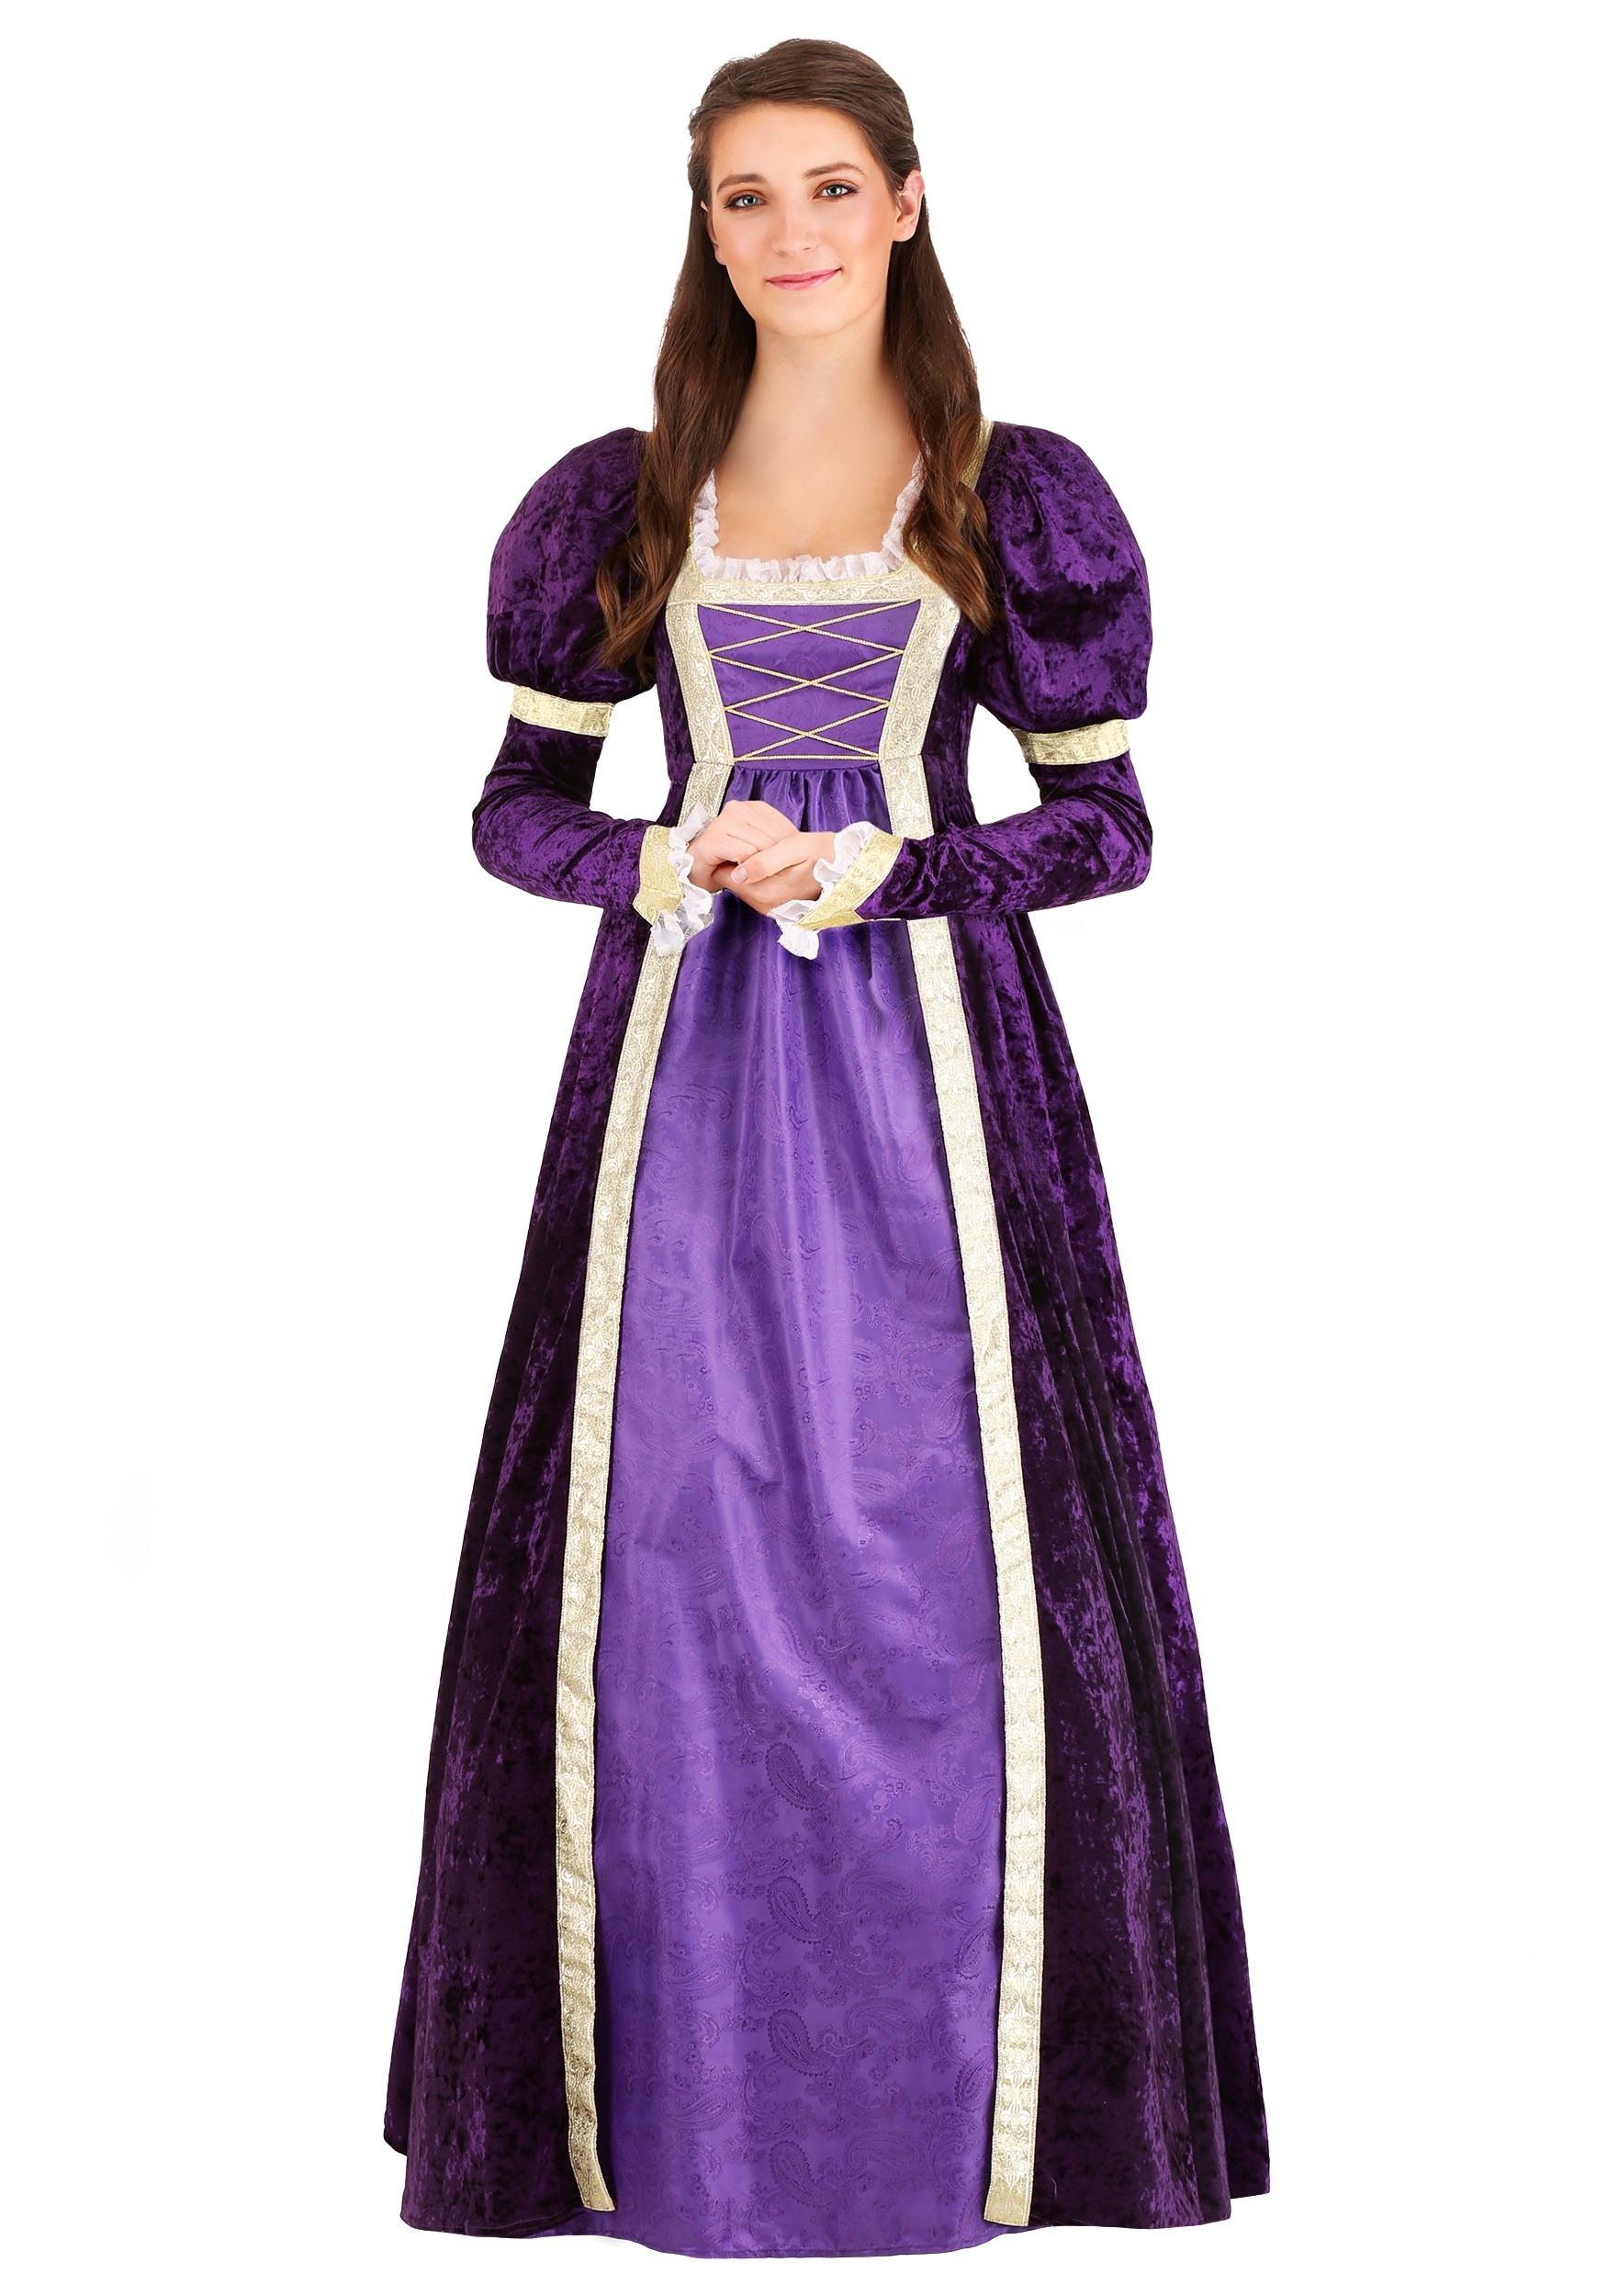 Regal Maiden Women's Costume